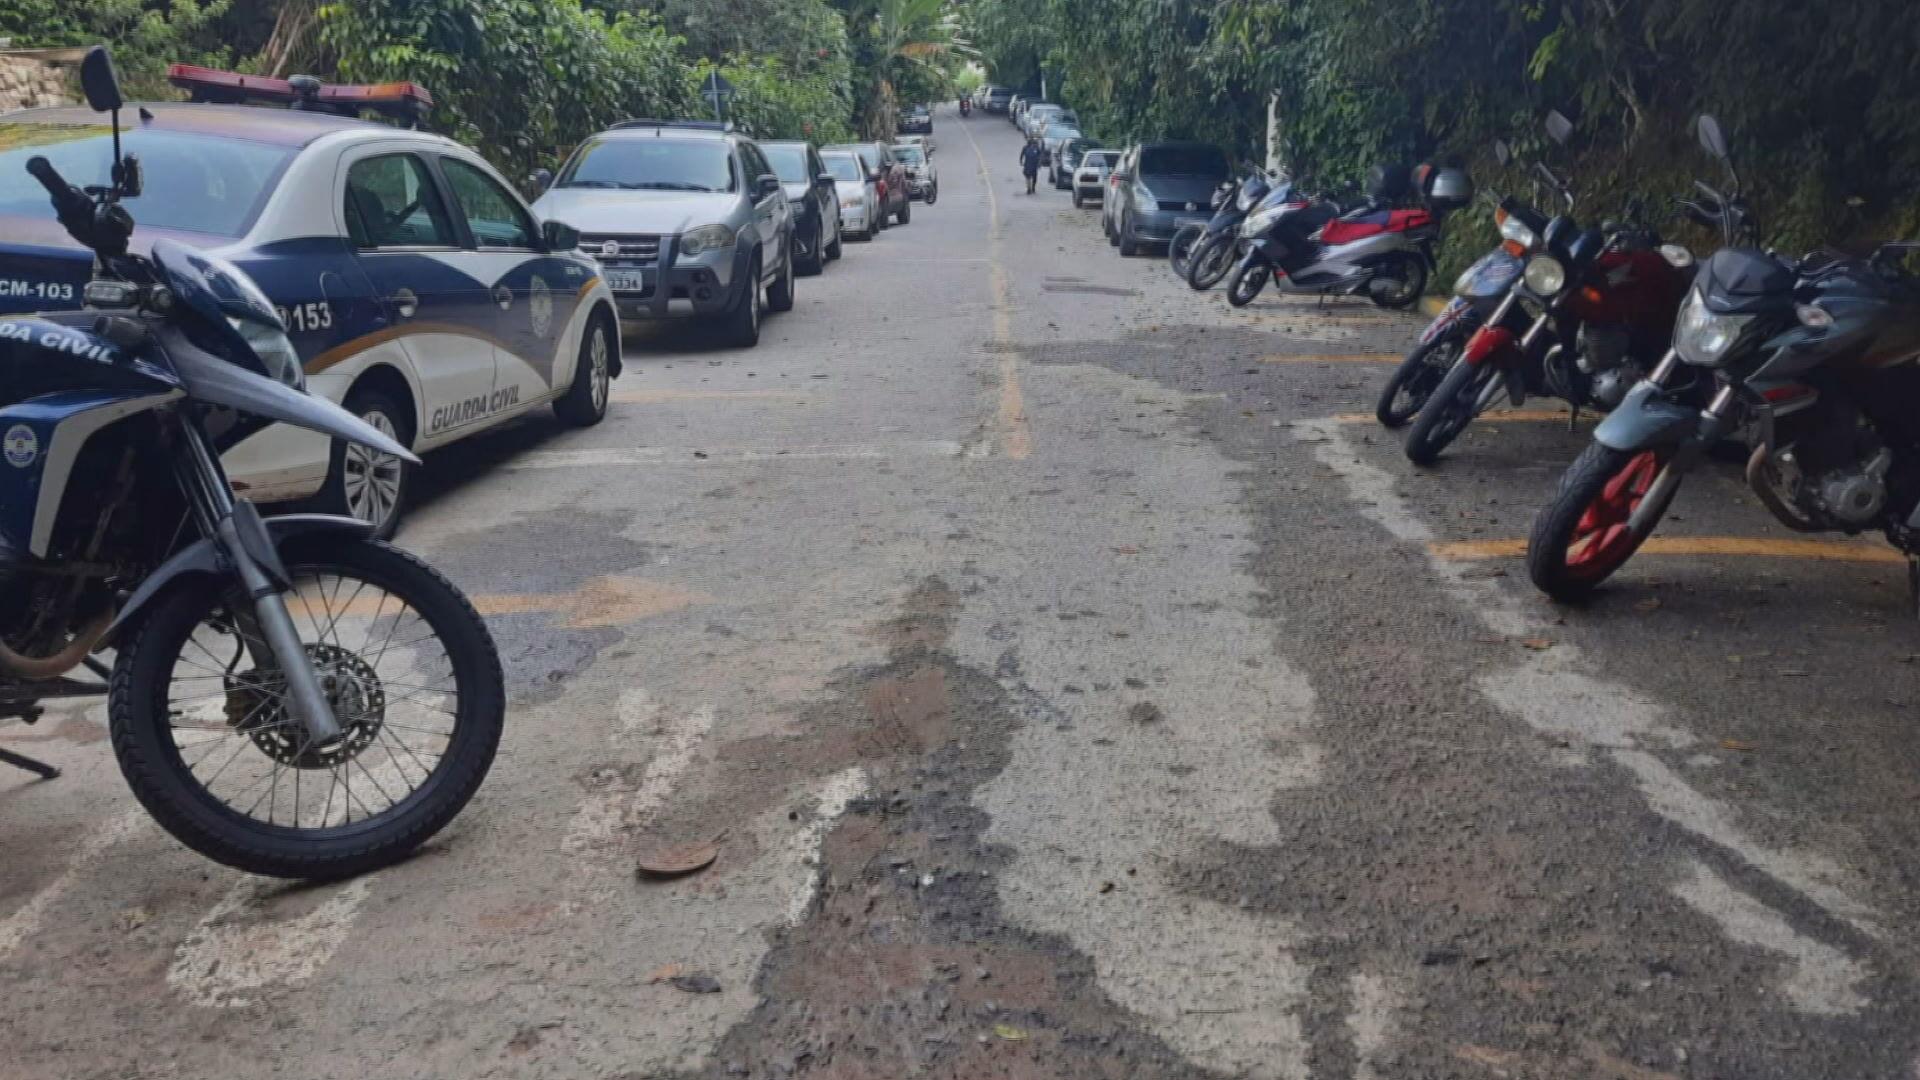 Guarda civil municipal interrompe festa clandestina no Guarujá